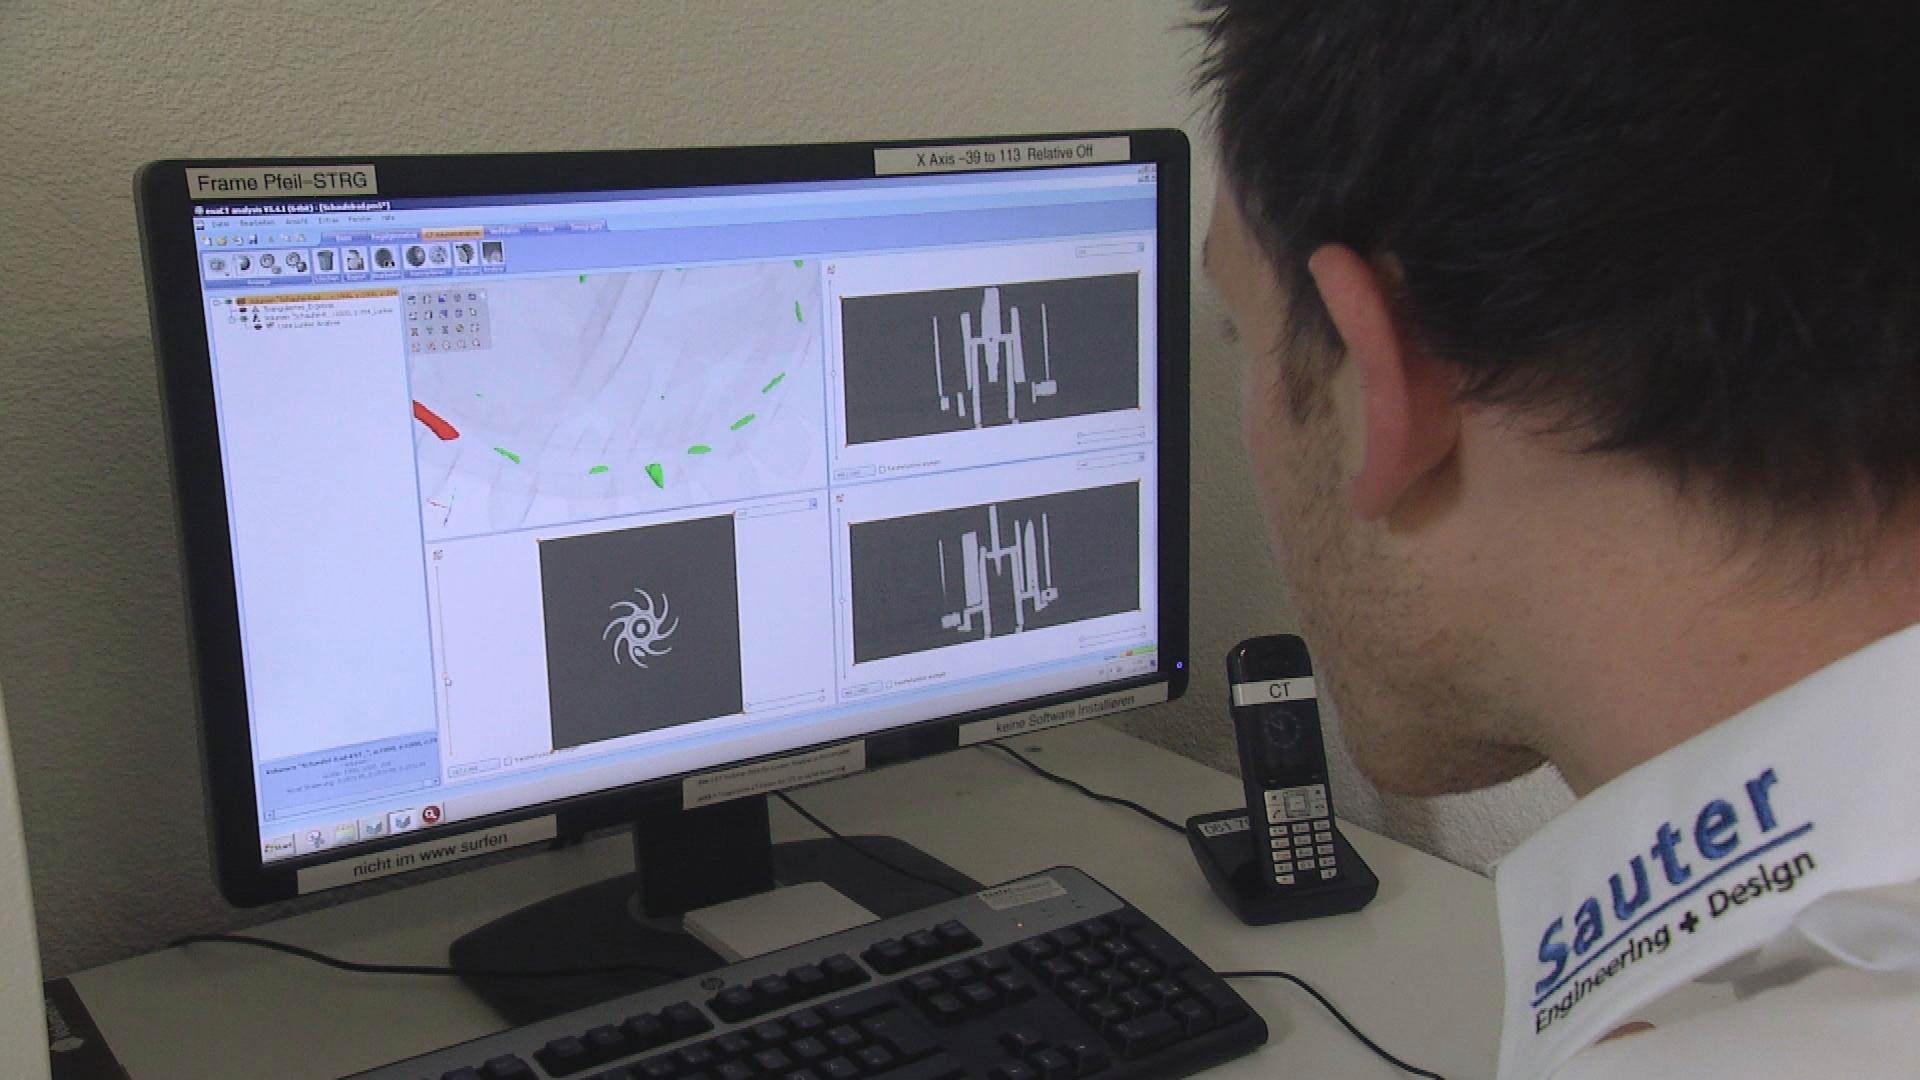 Sauter_Engineering+Design_Industrielle_Messtechnik-Geometrie+Material-Inspection-a